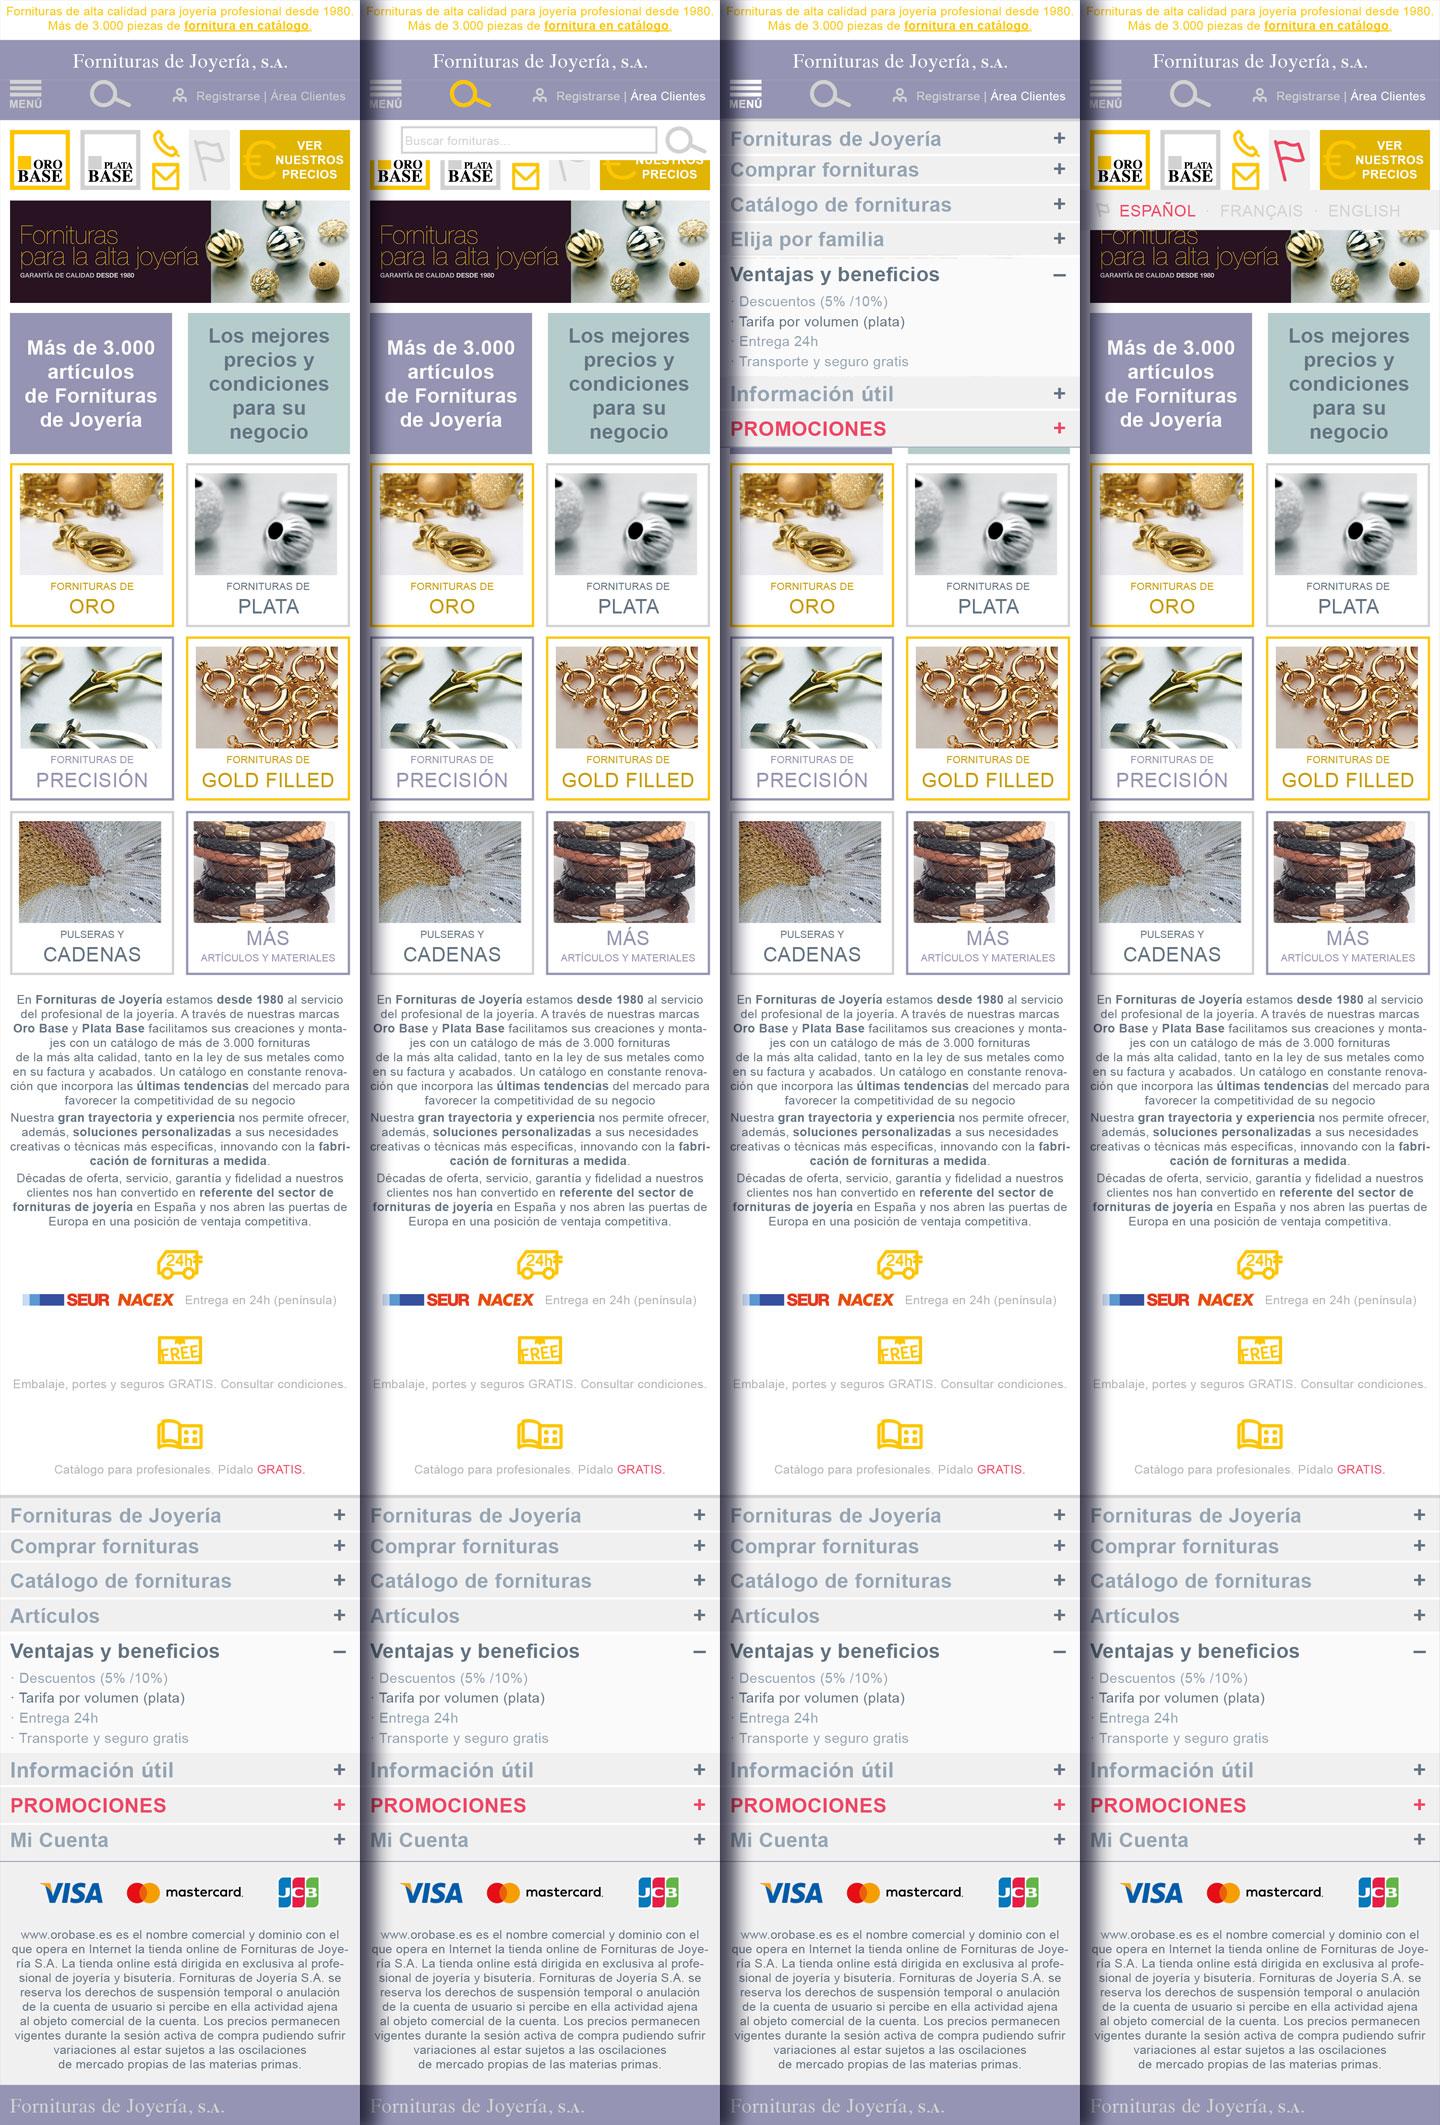 Fornituras de Joyería. Catálogo web: prototipado diseños web formato responsive para móvil